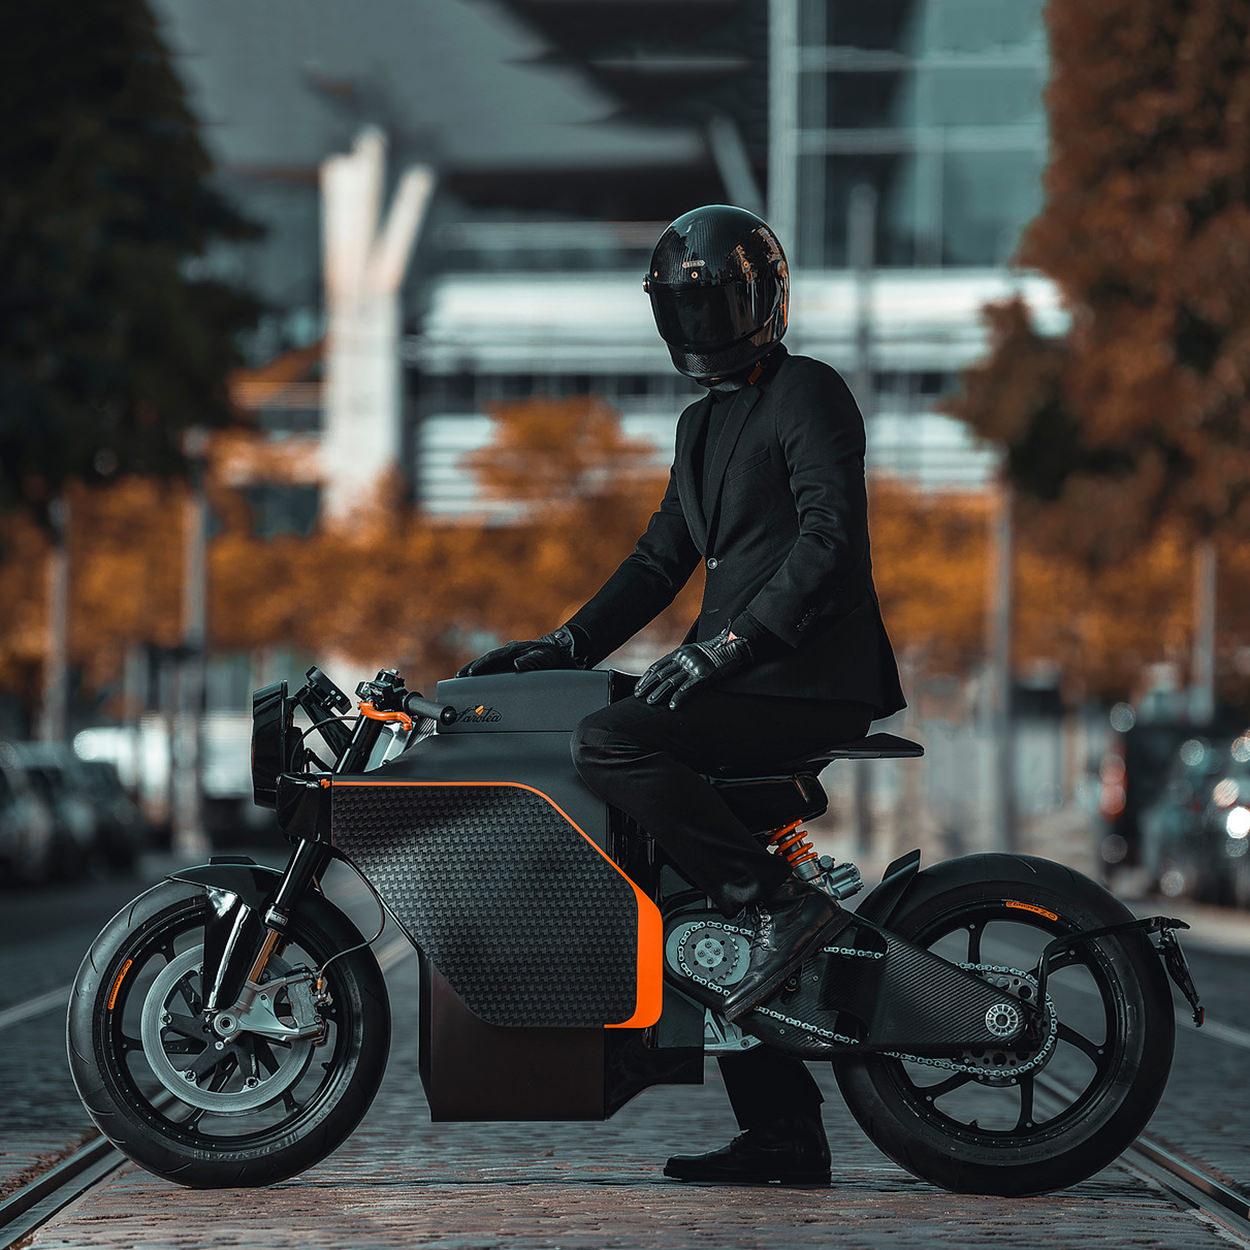 Saroléa x Mighty Machines Manx7 electric motorcycle